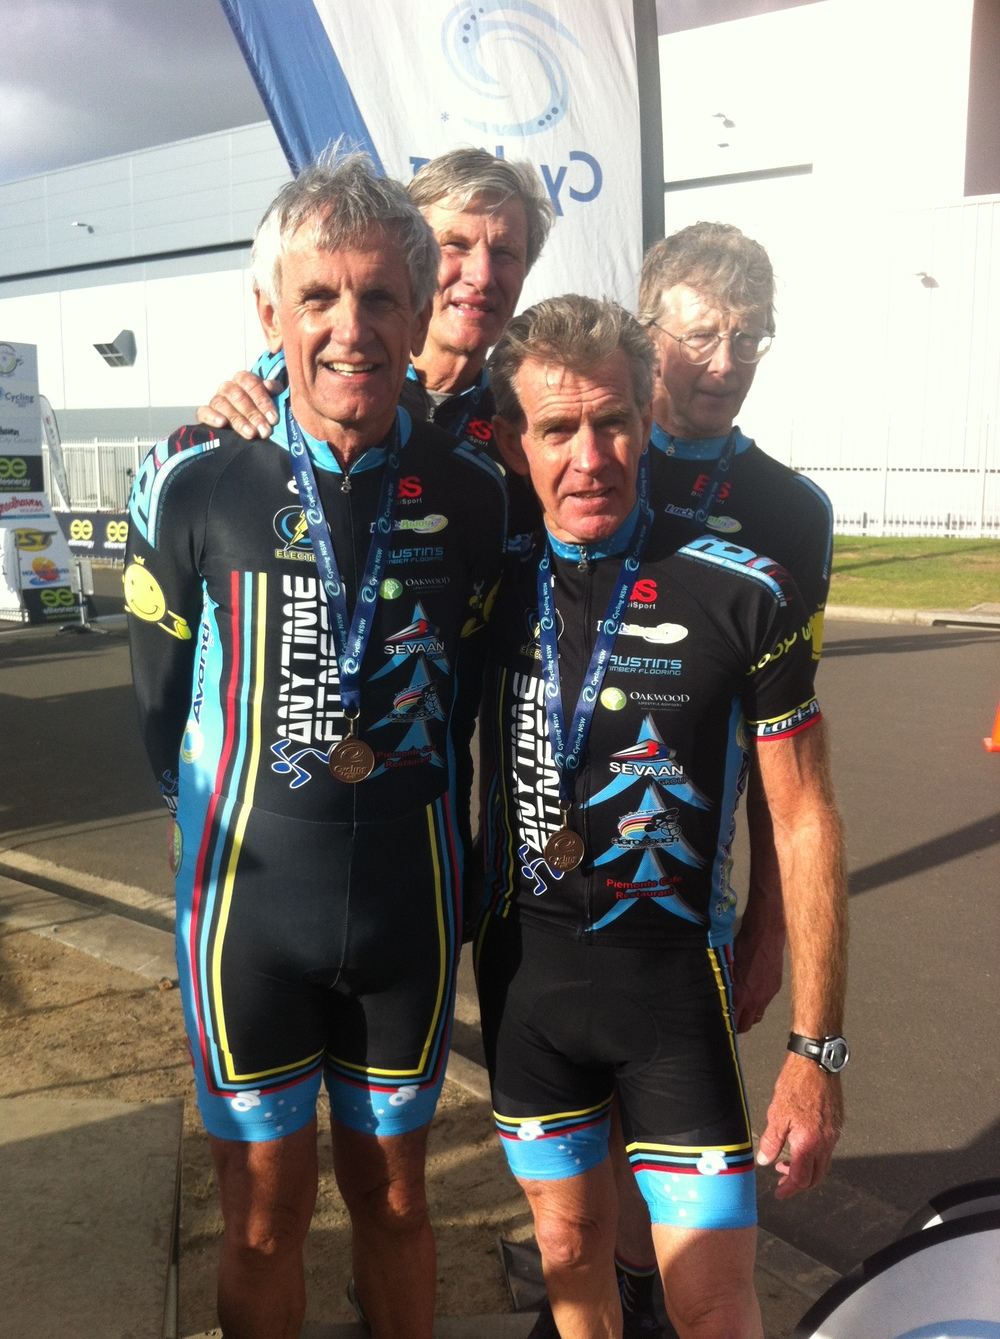 BiciSport Bronze 180+ - Ian Grainger, Raoul Westbrook, Mike Lawson, Peter Verhoeven